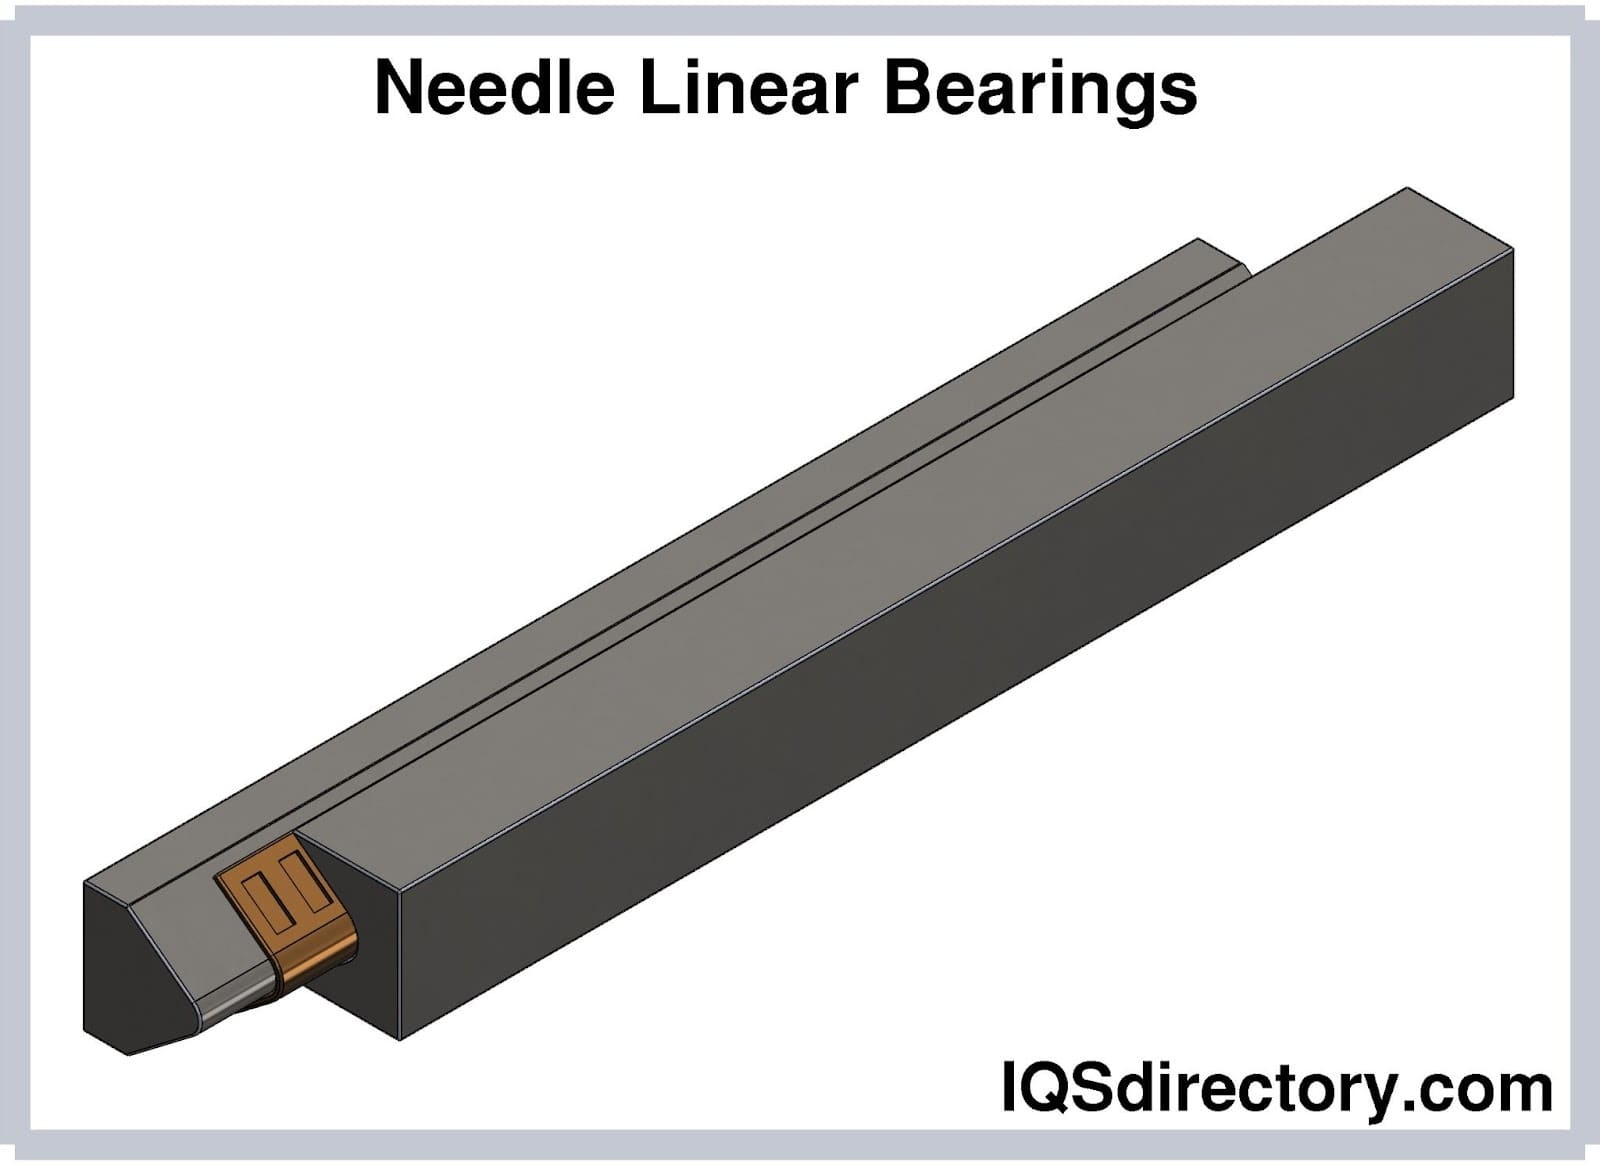 Needle Linear Bearings